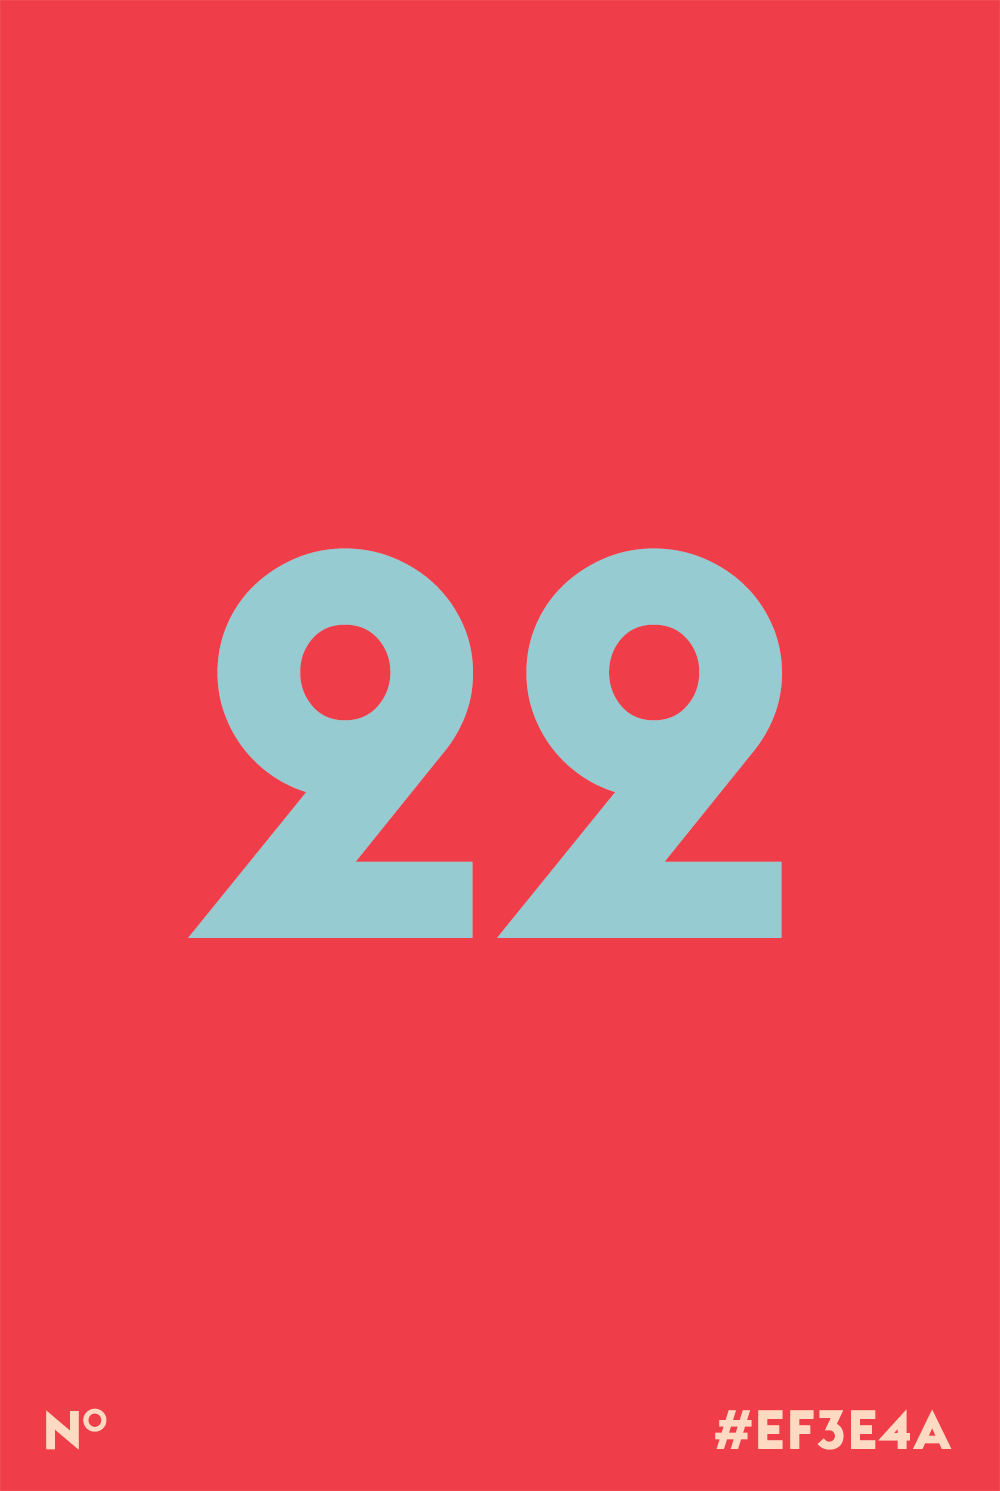 cc_0021_22